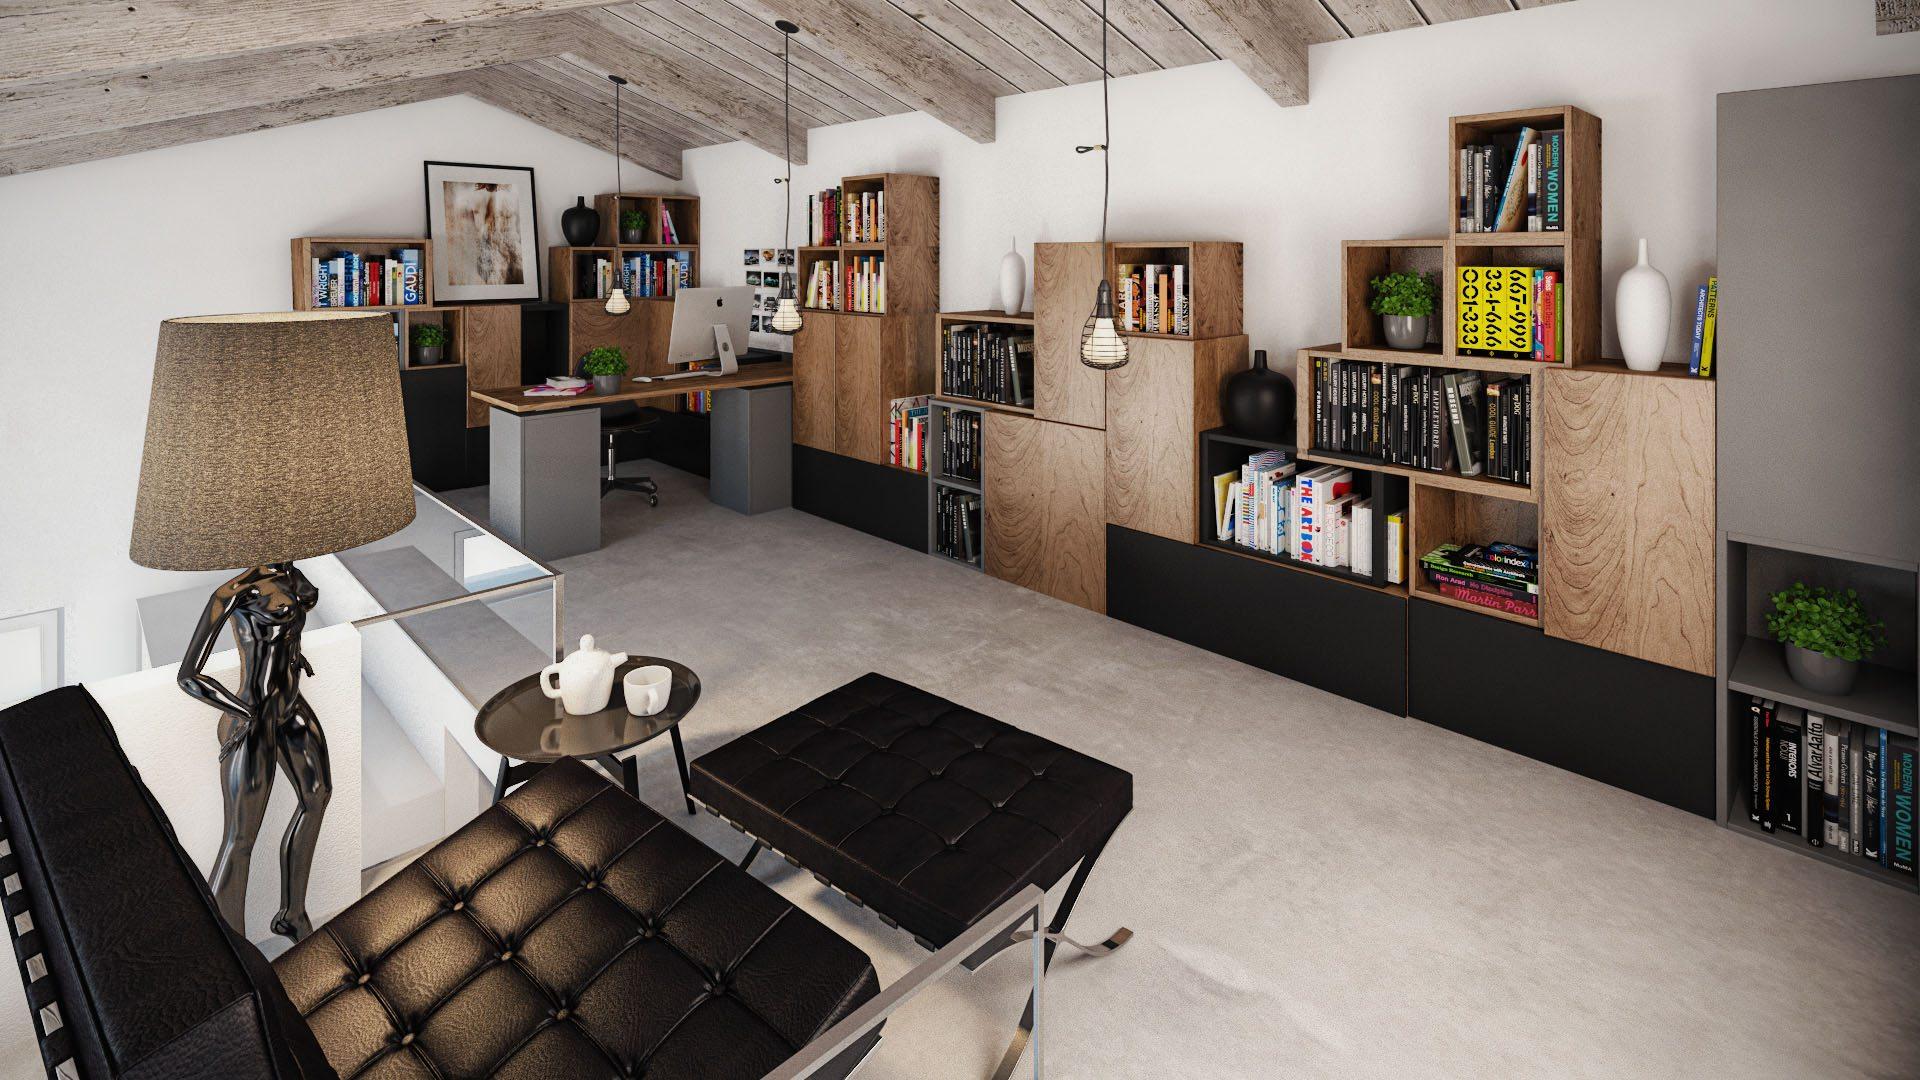 archicostudio_oreokastro_h1_office